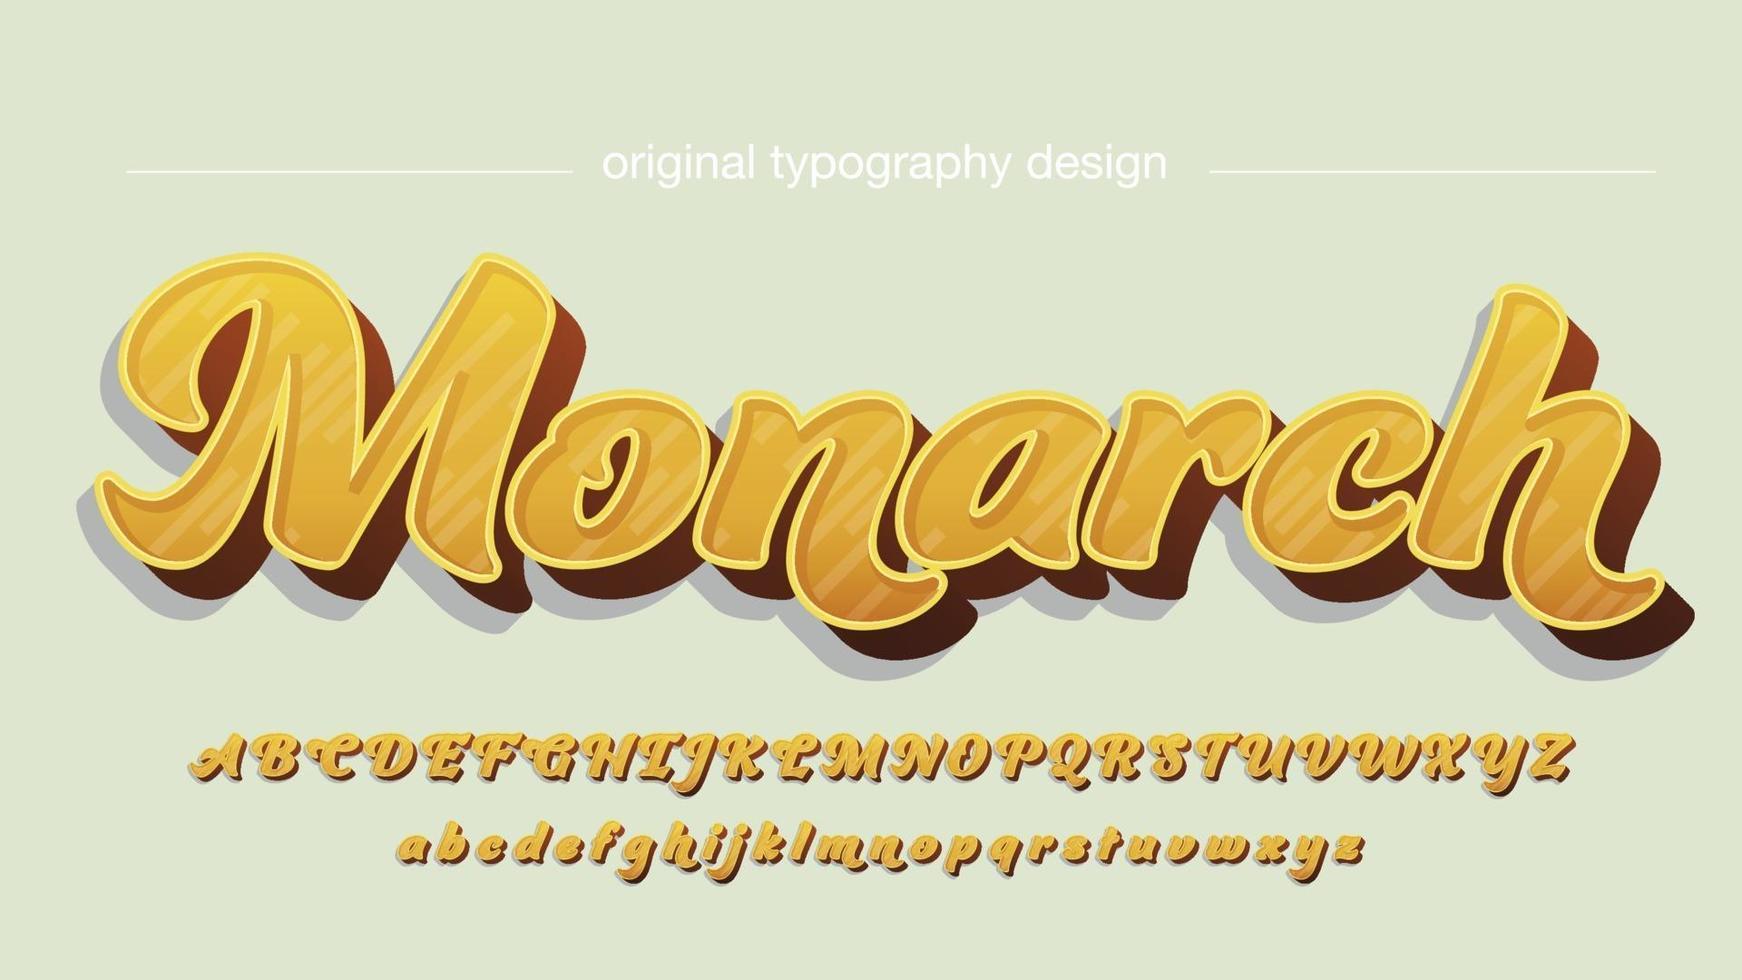 caligrafia elegante 3d amarela vetor